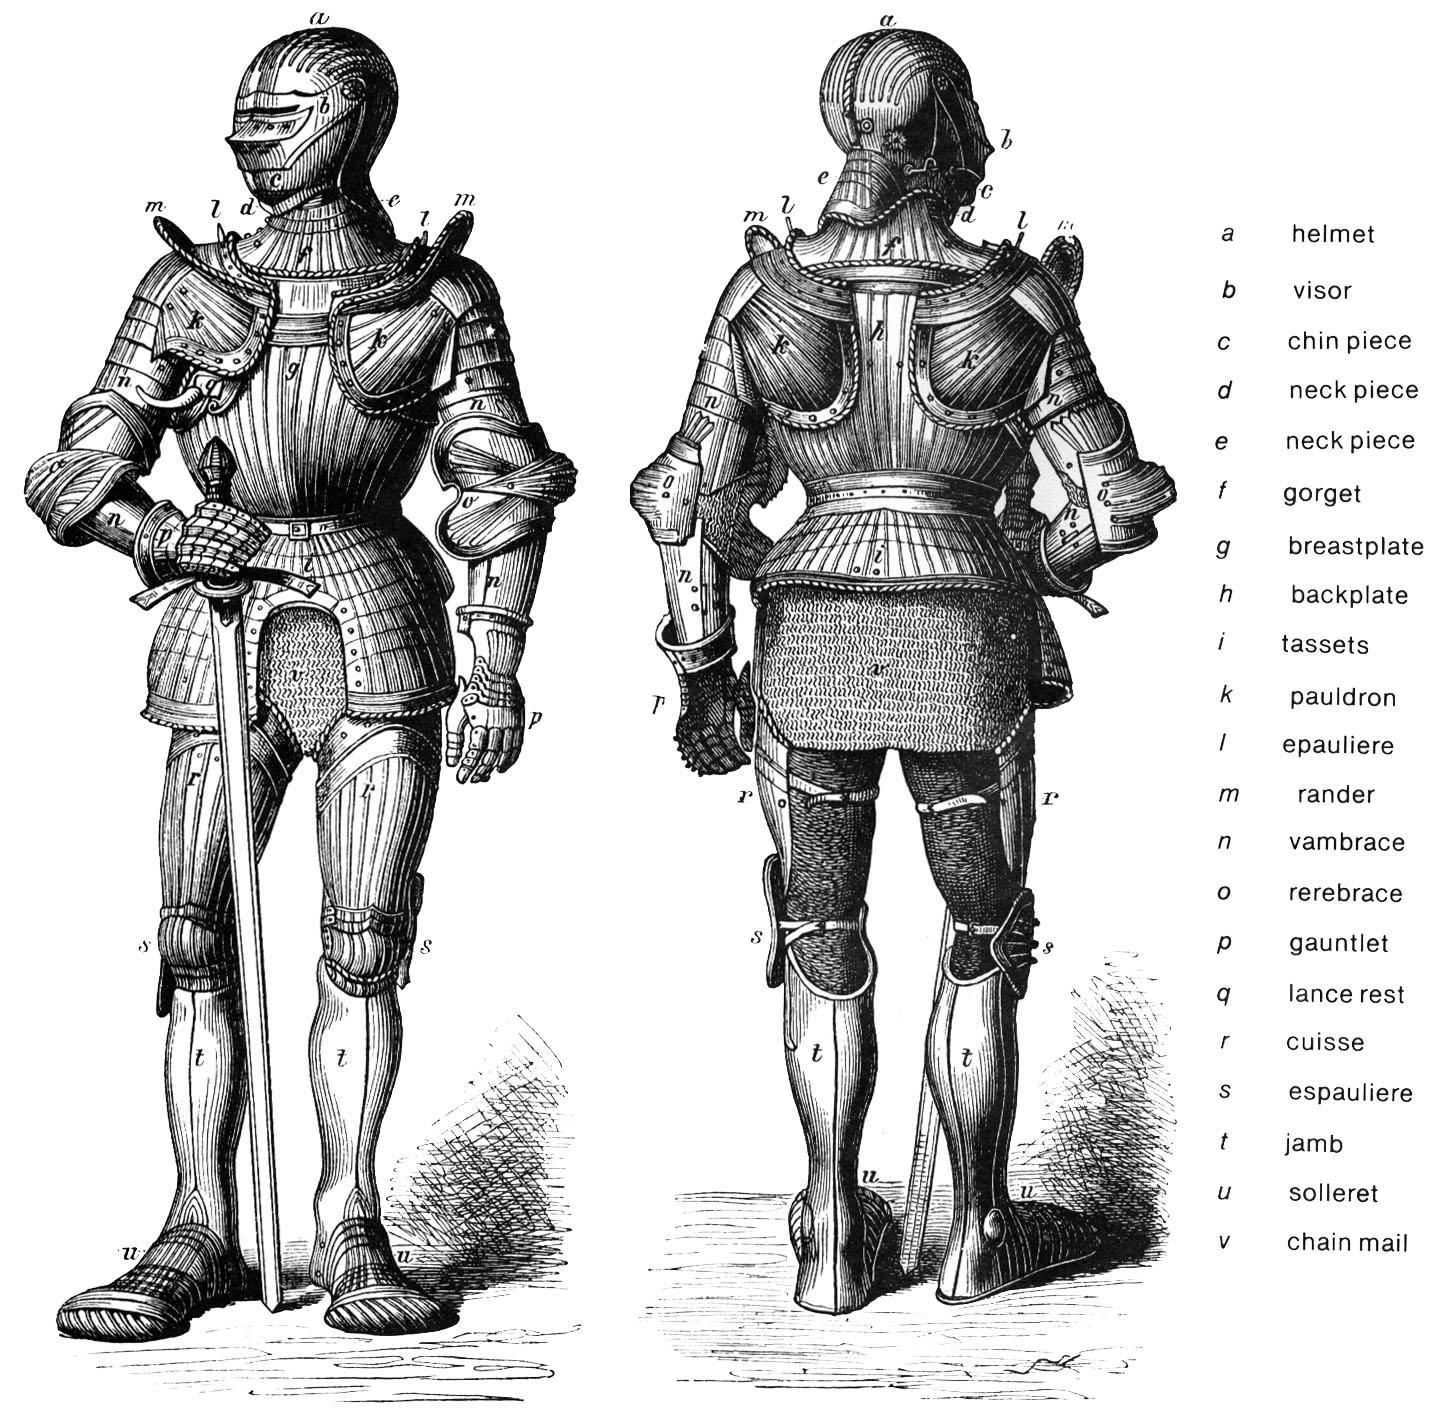 Knight Armor Armors And Knight